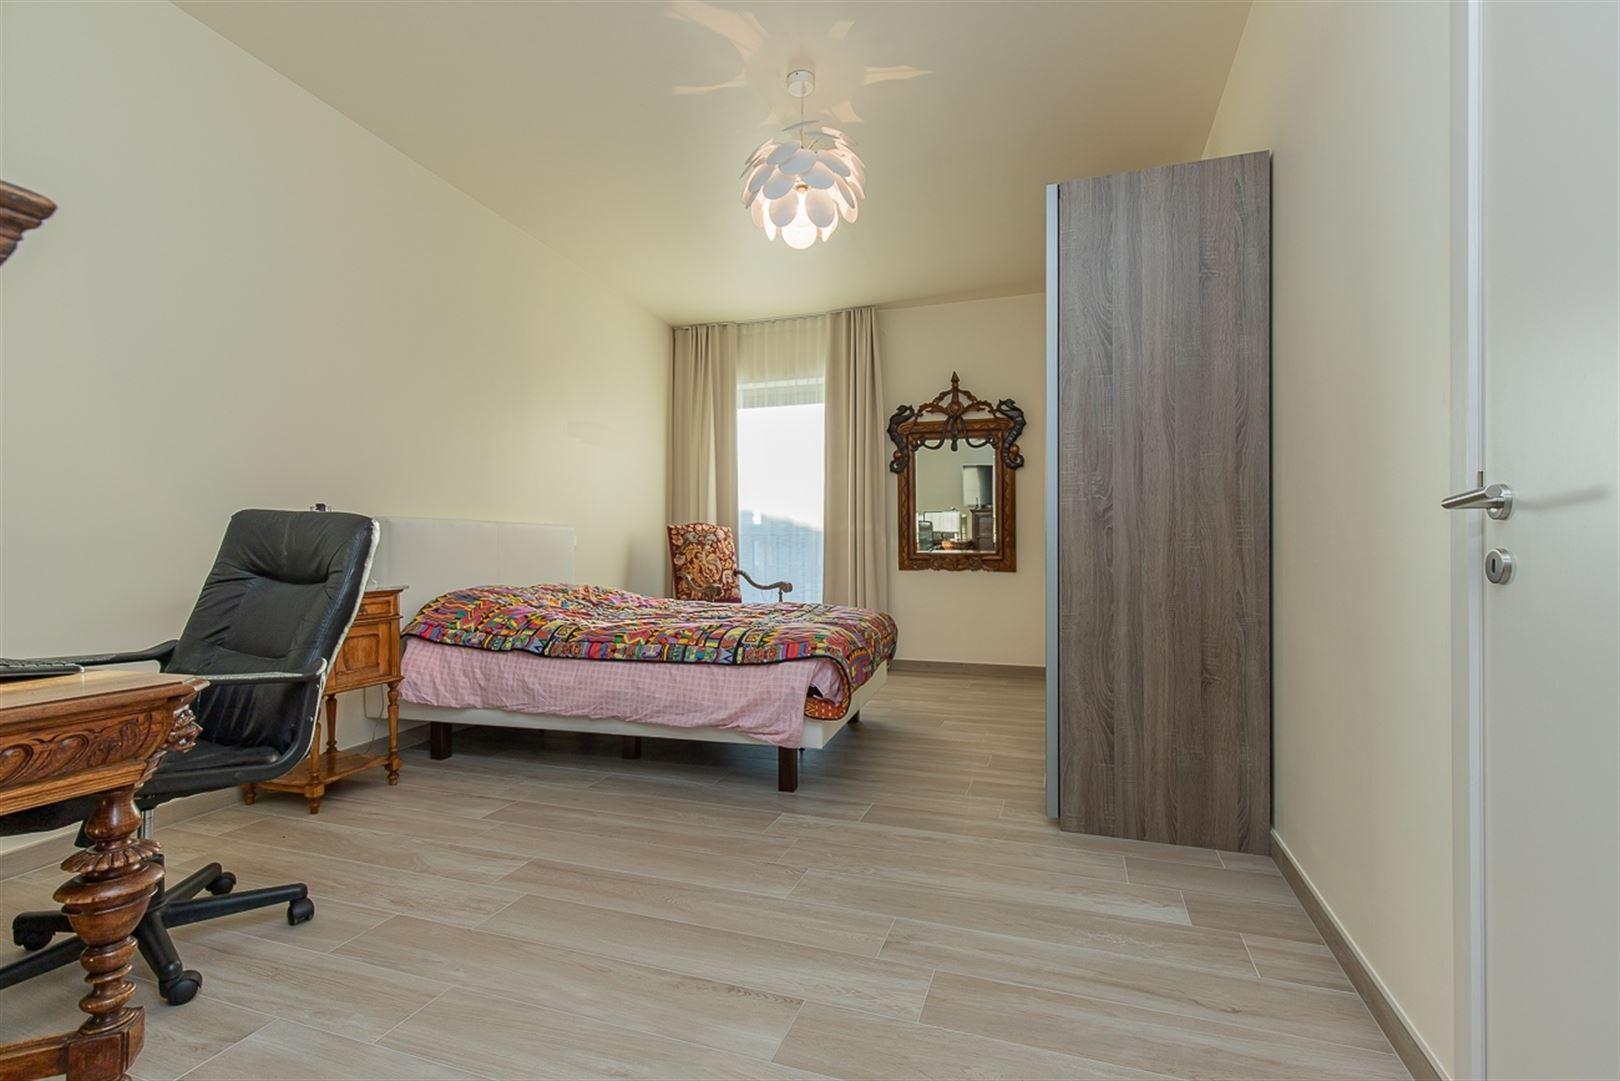 Foto 9 : Duplex/Penthouse te 9200 DENDERMONDE (België) - Prijs € 399.000